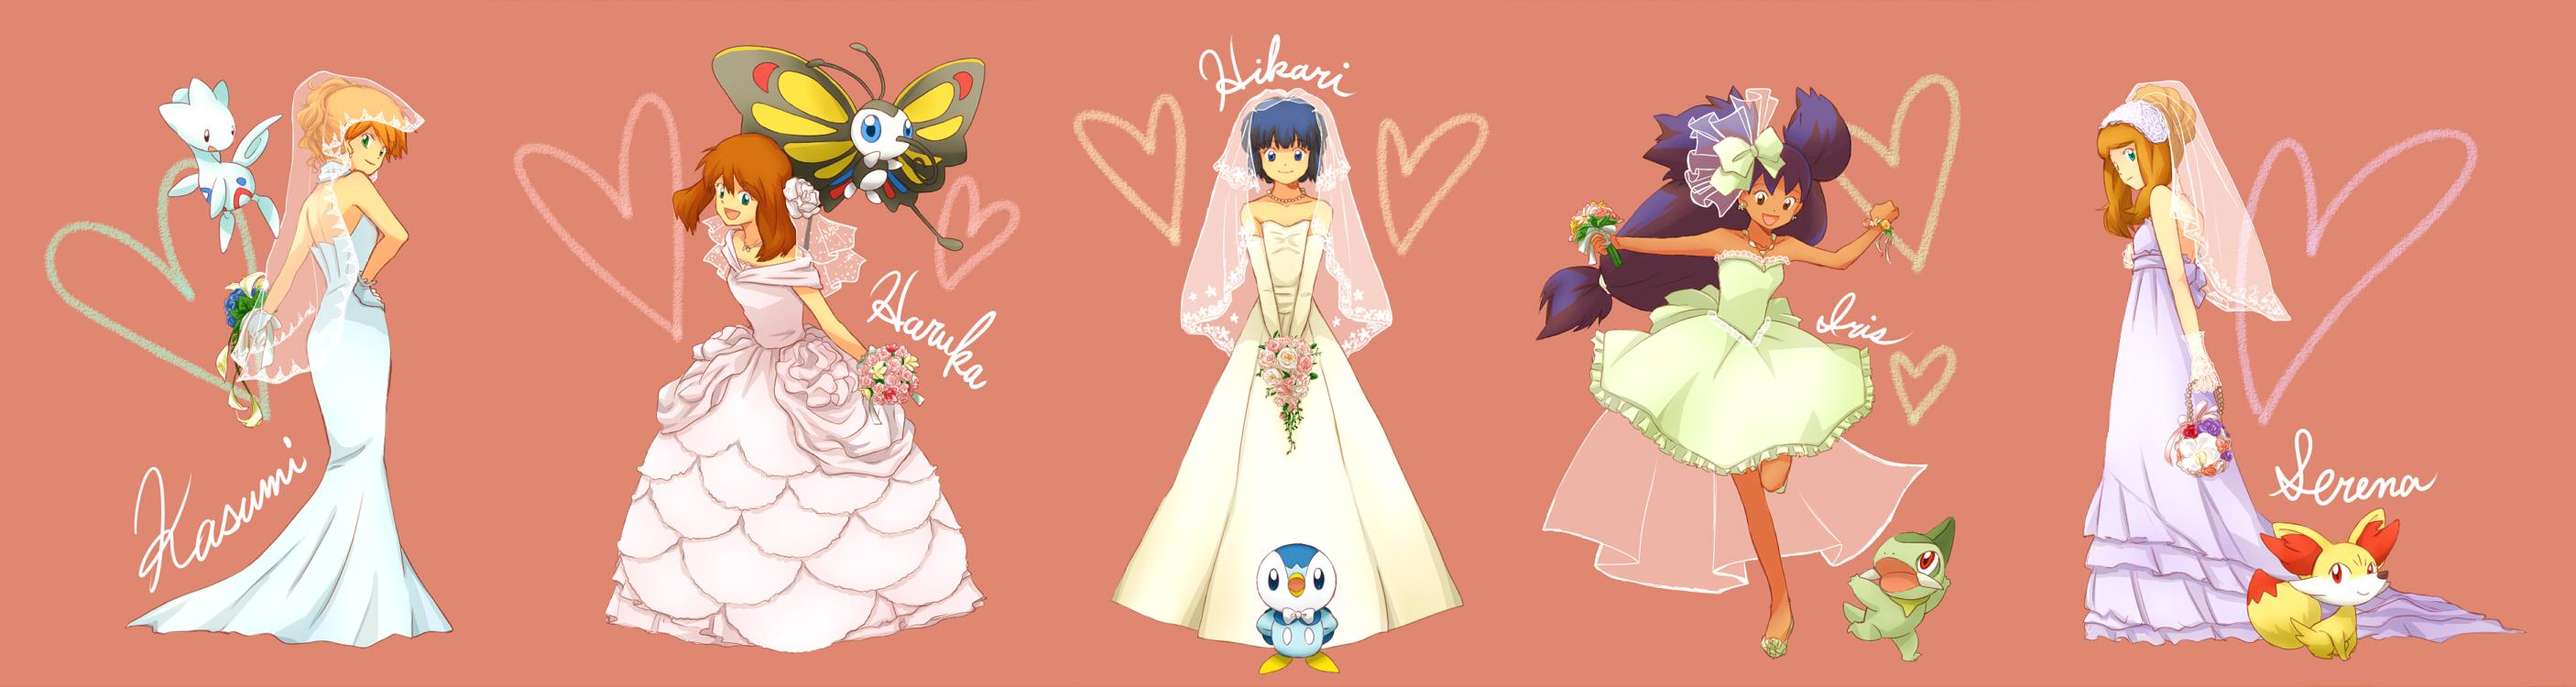 Pokemon Serena Dress Up